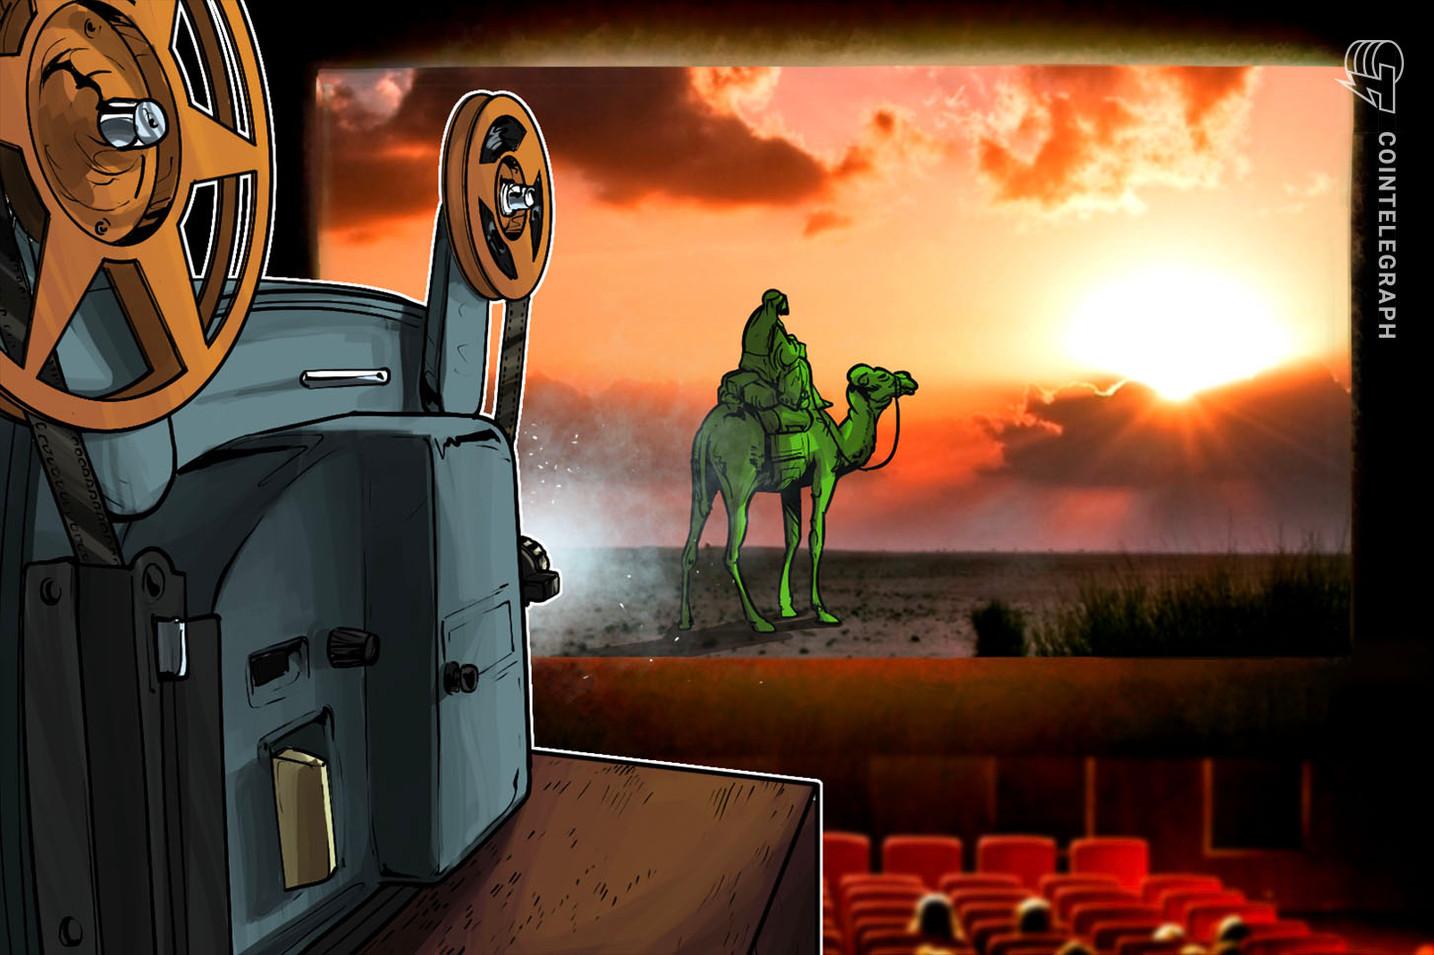 CBS doco on Silk Road throws spotlight on Ross Ulbricht